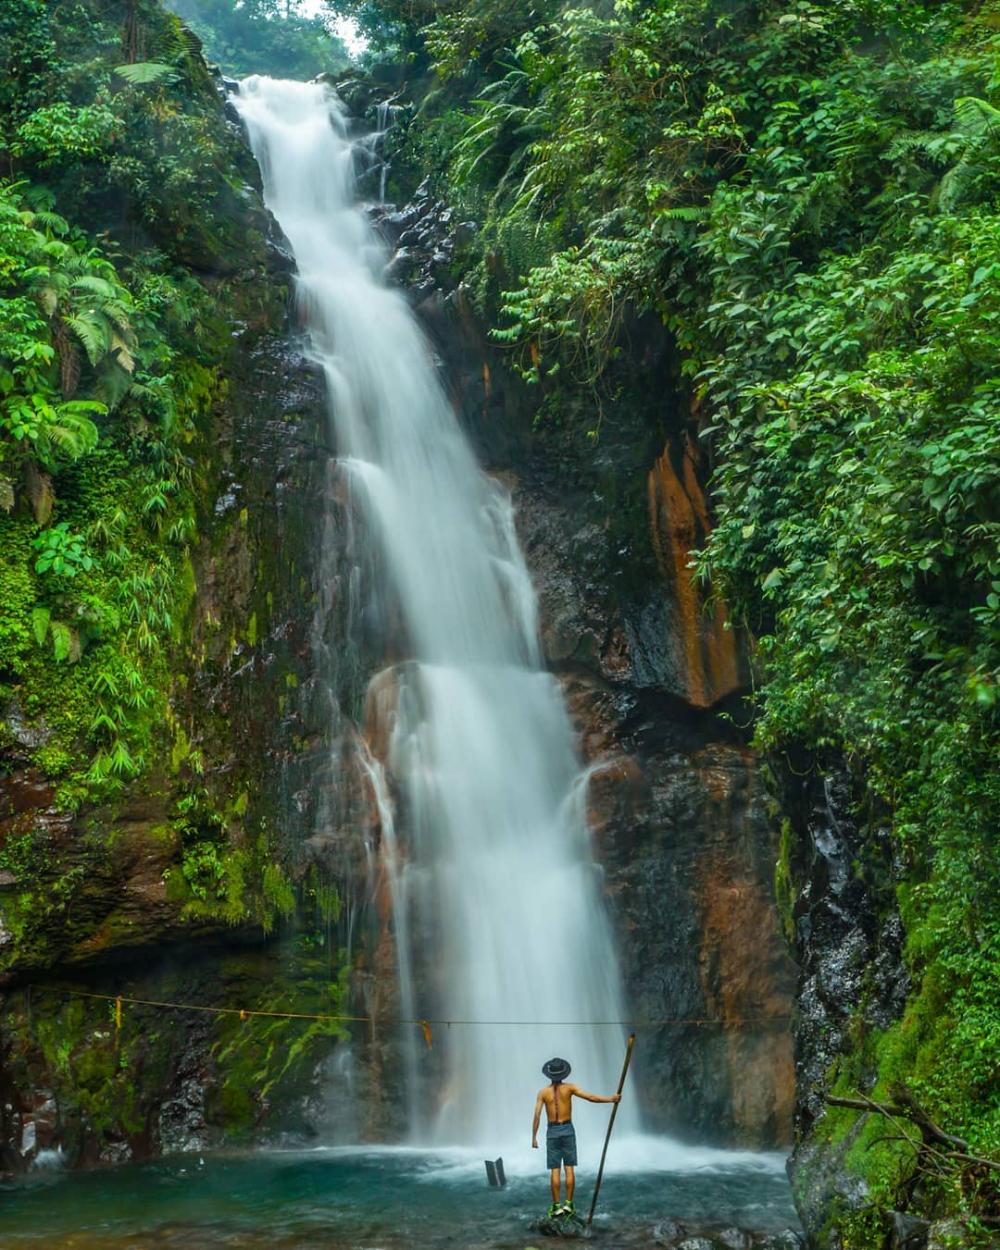 Curug Cigamea Bogor Di 2020 Luar Ruangan Air Terjun Bawah Air